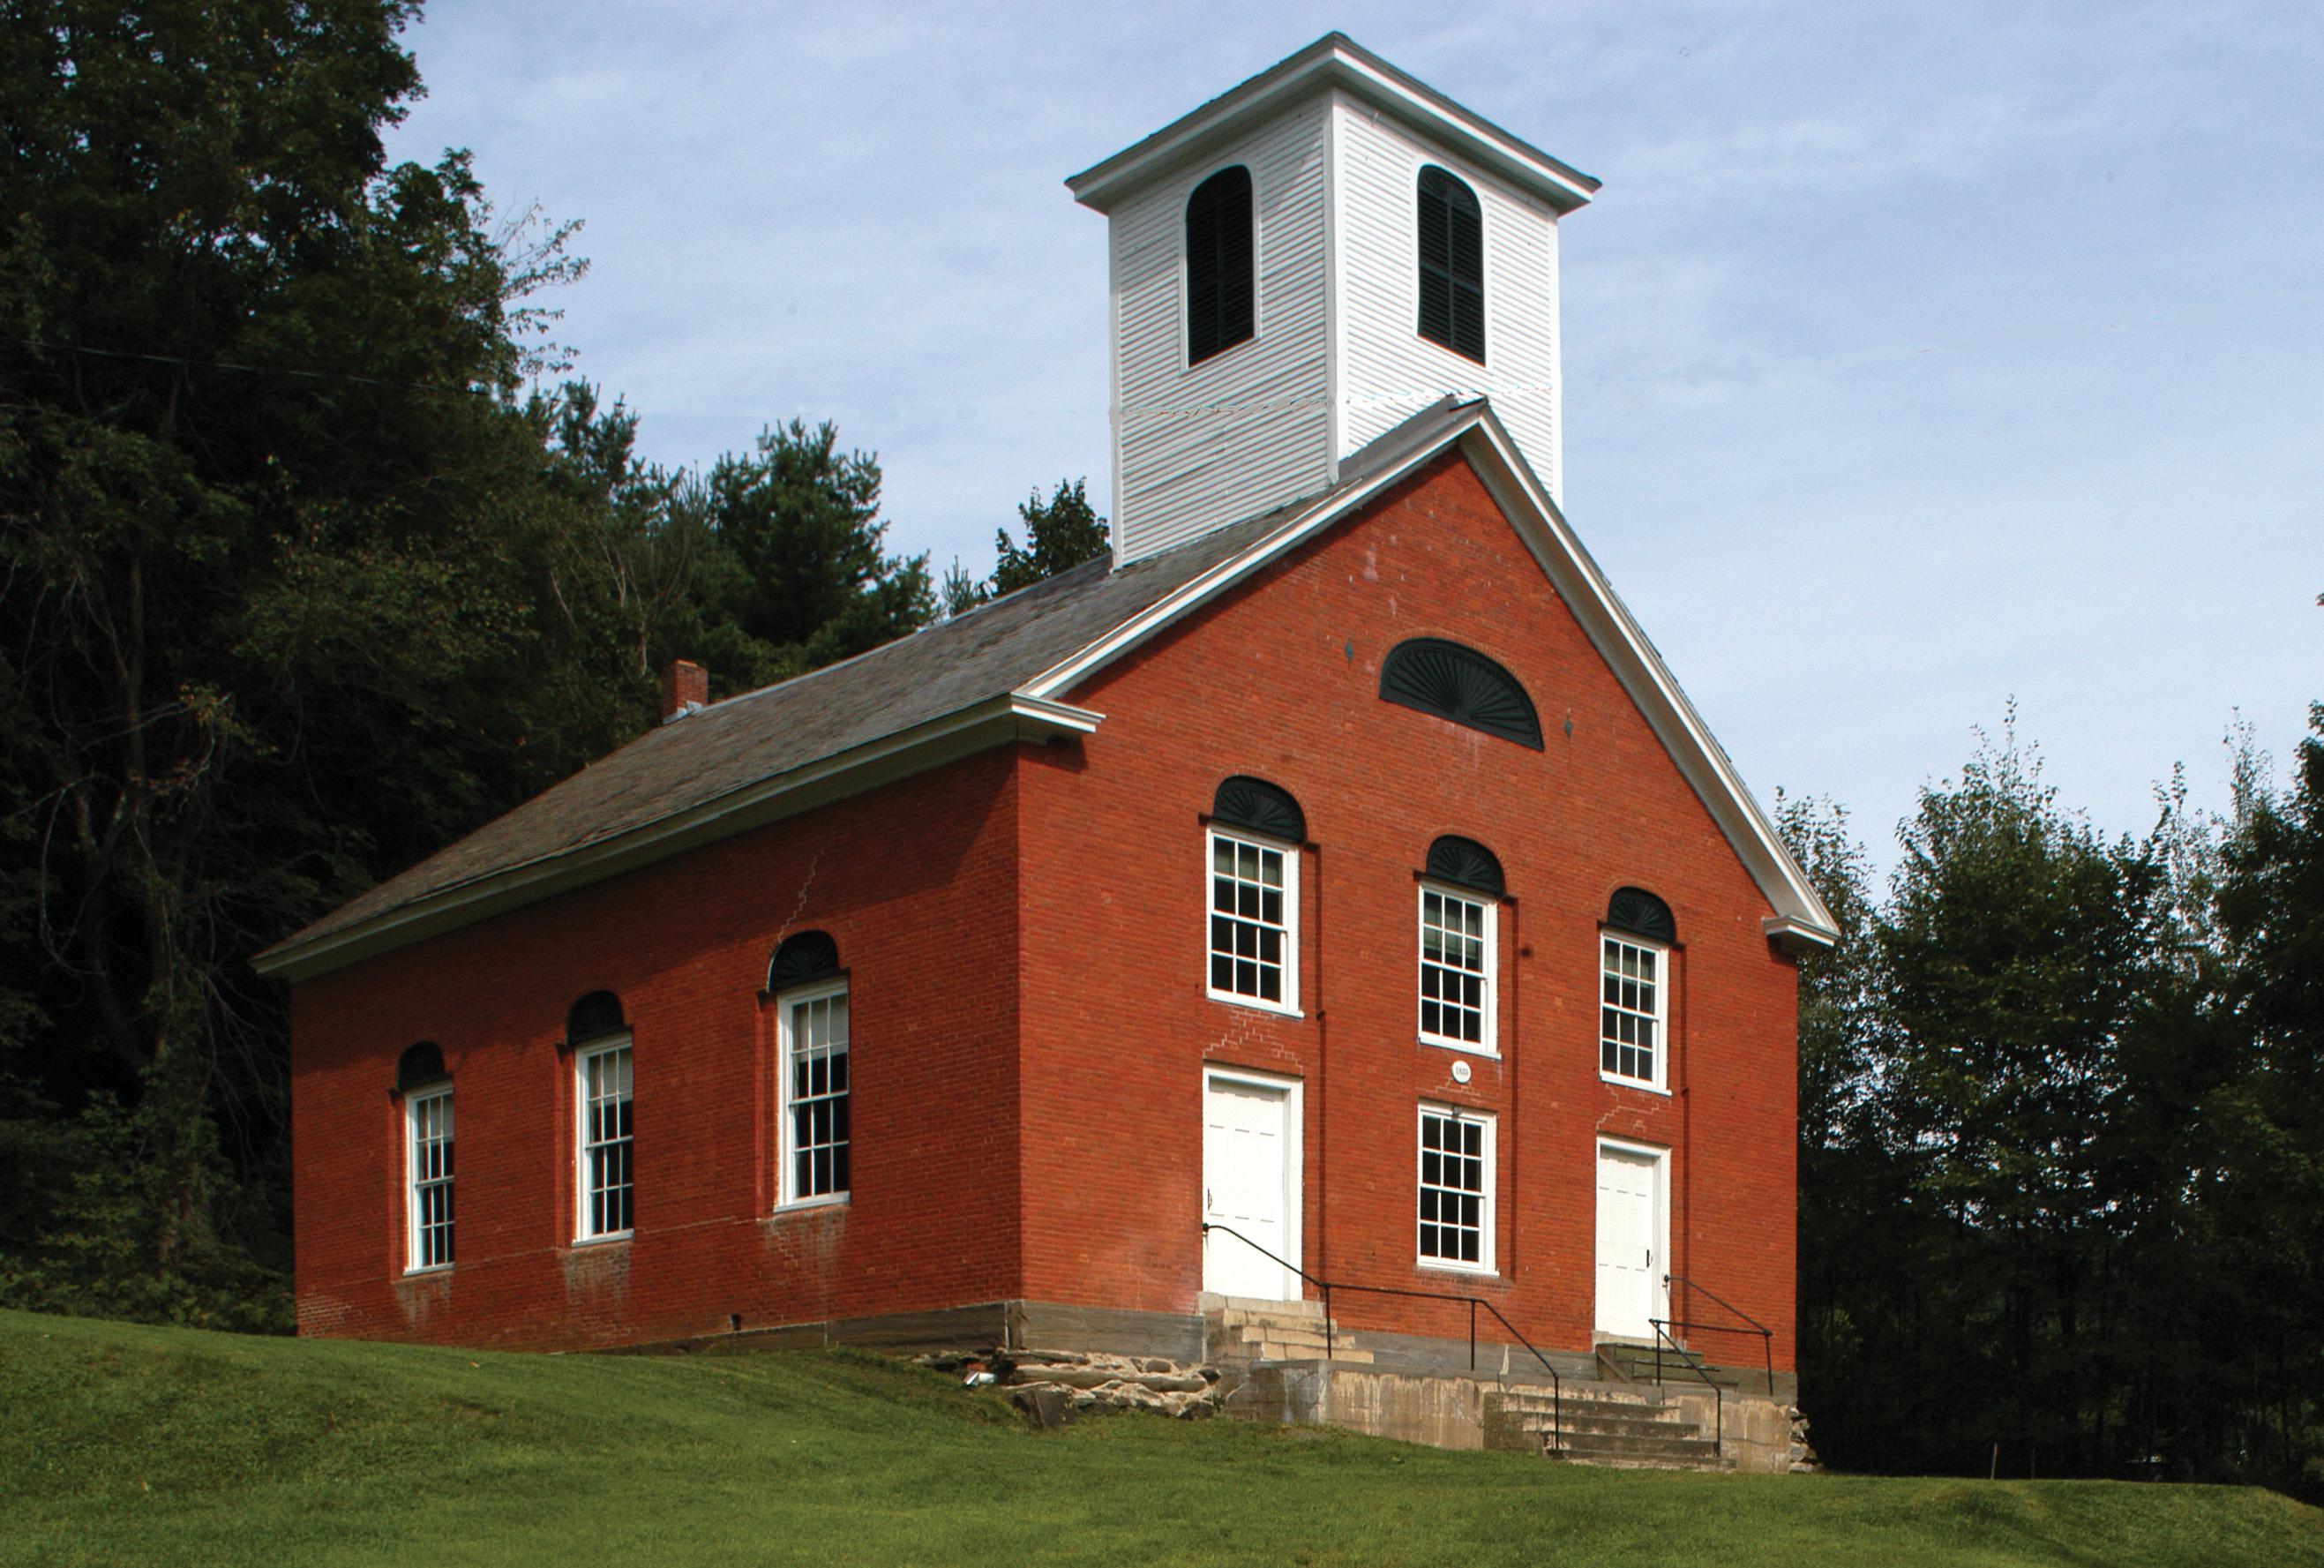 South Tunbridge Methodist Church